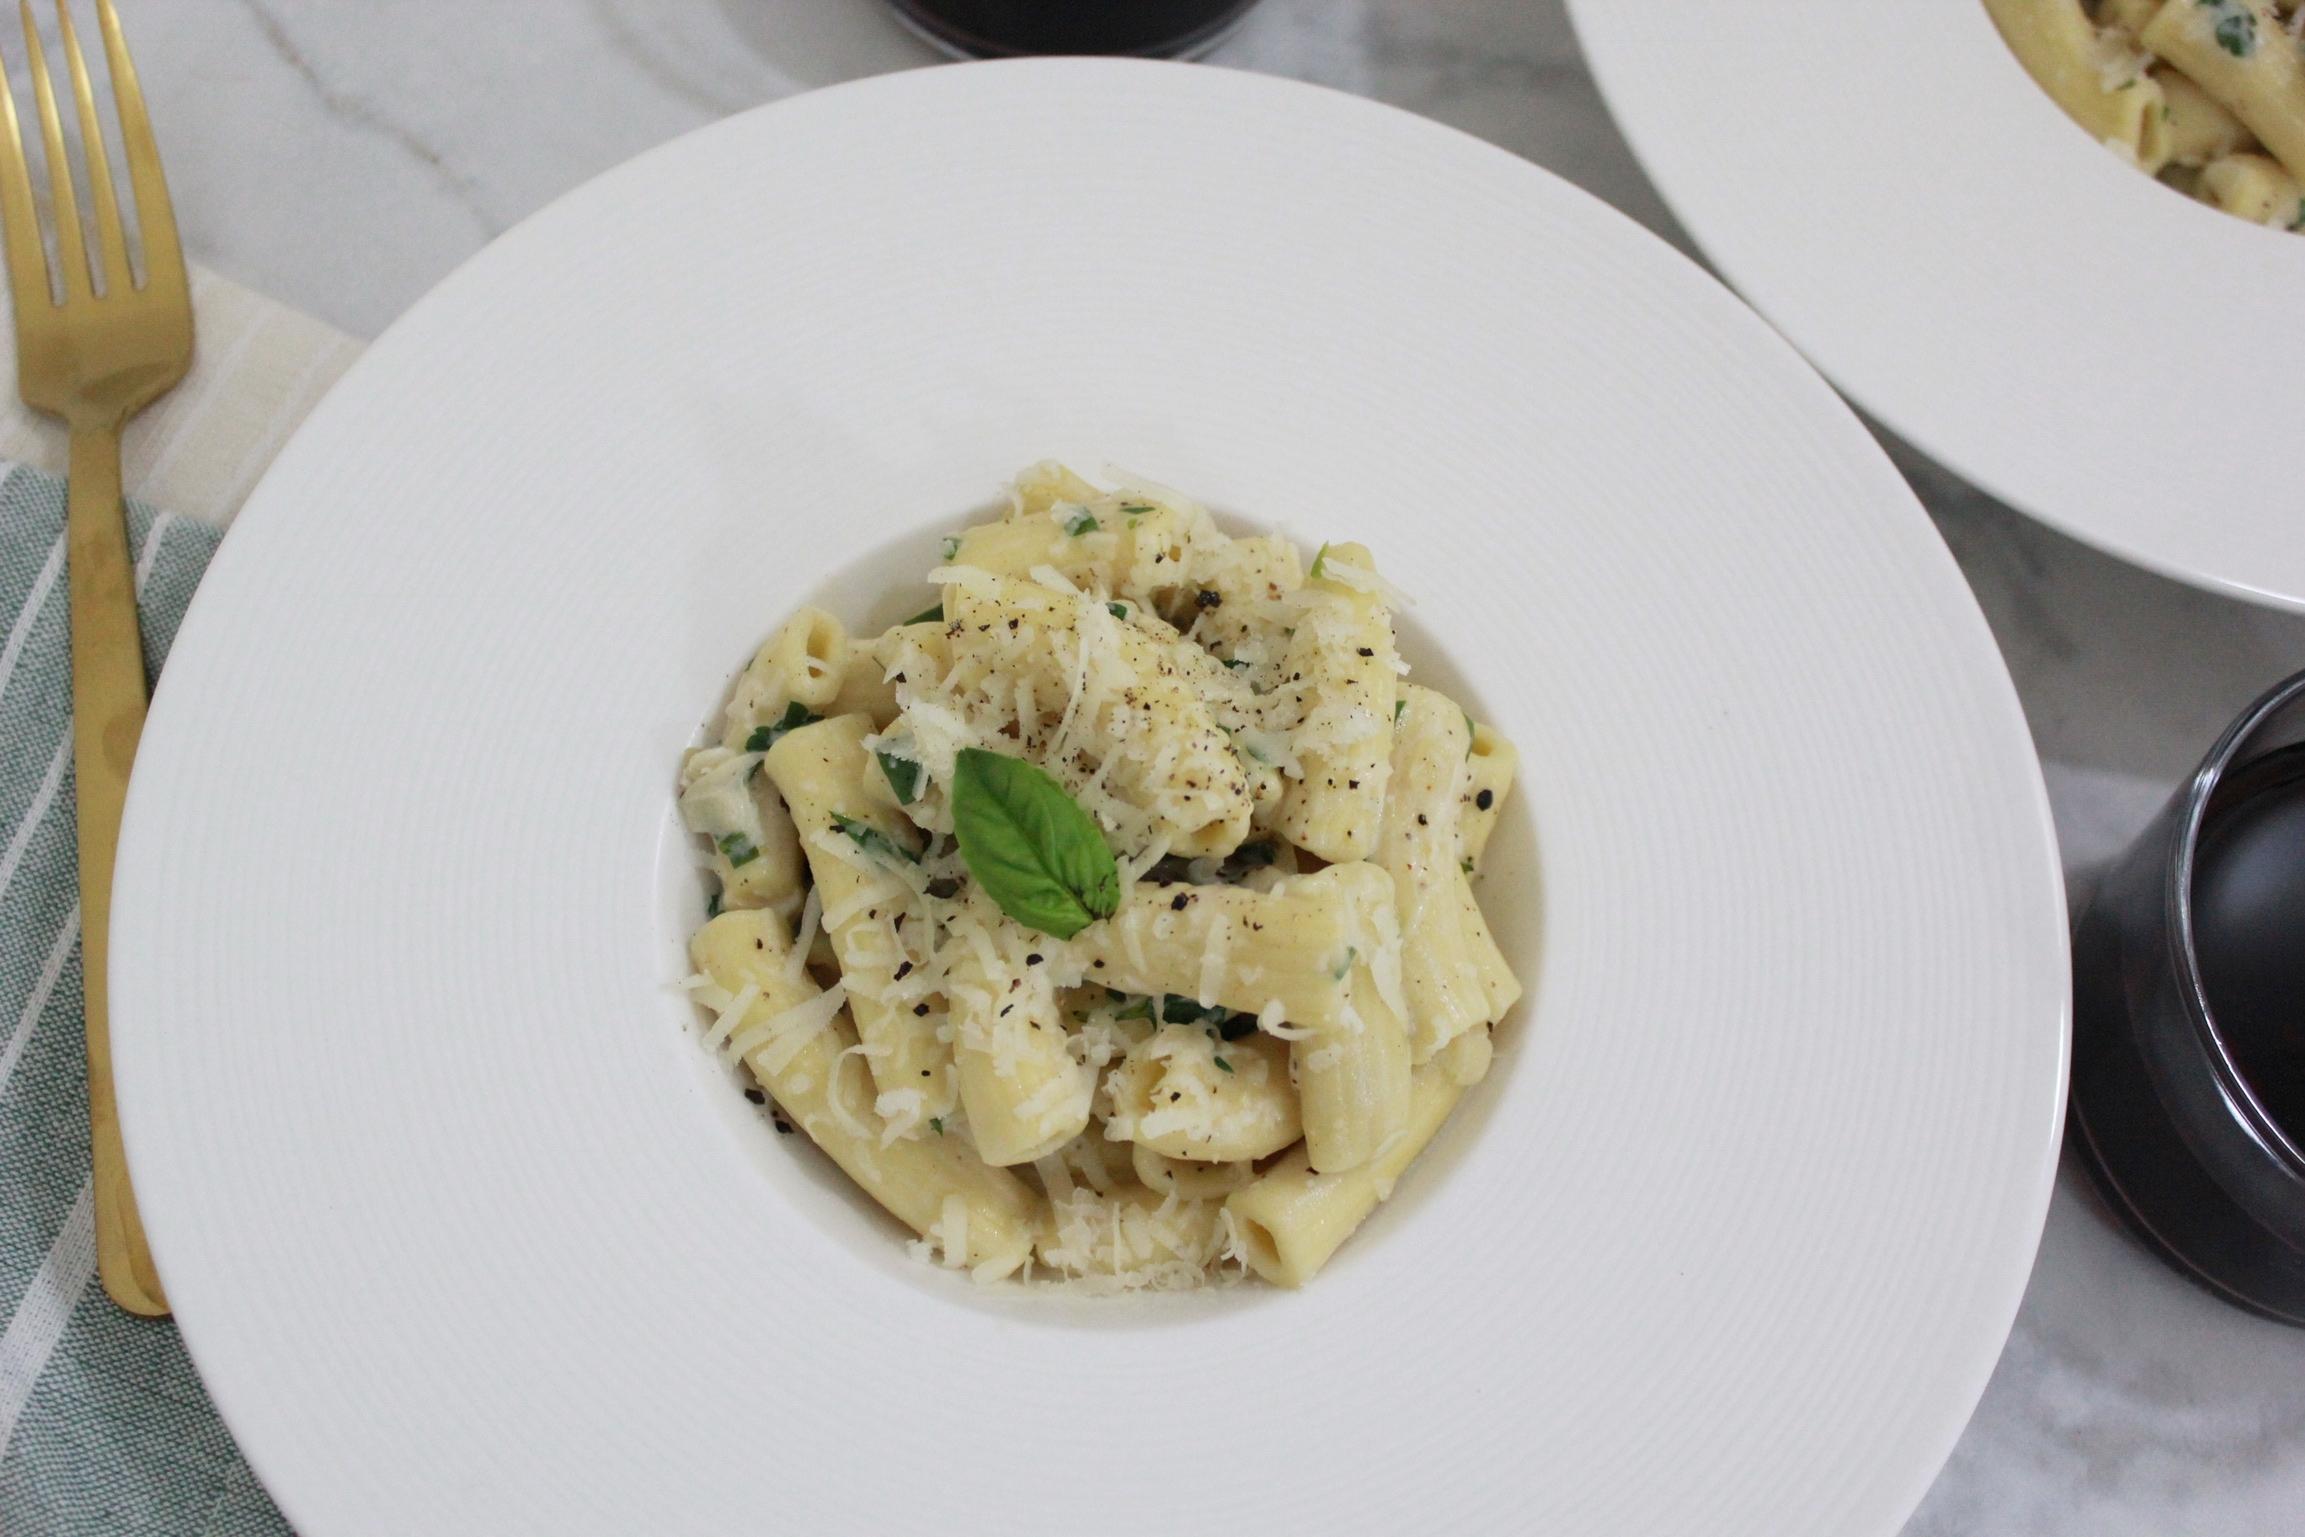 Housemade Rigatoni in Garlic Cream Sauce